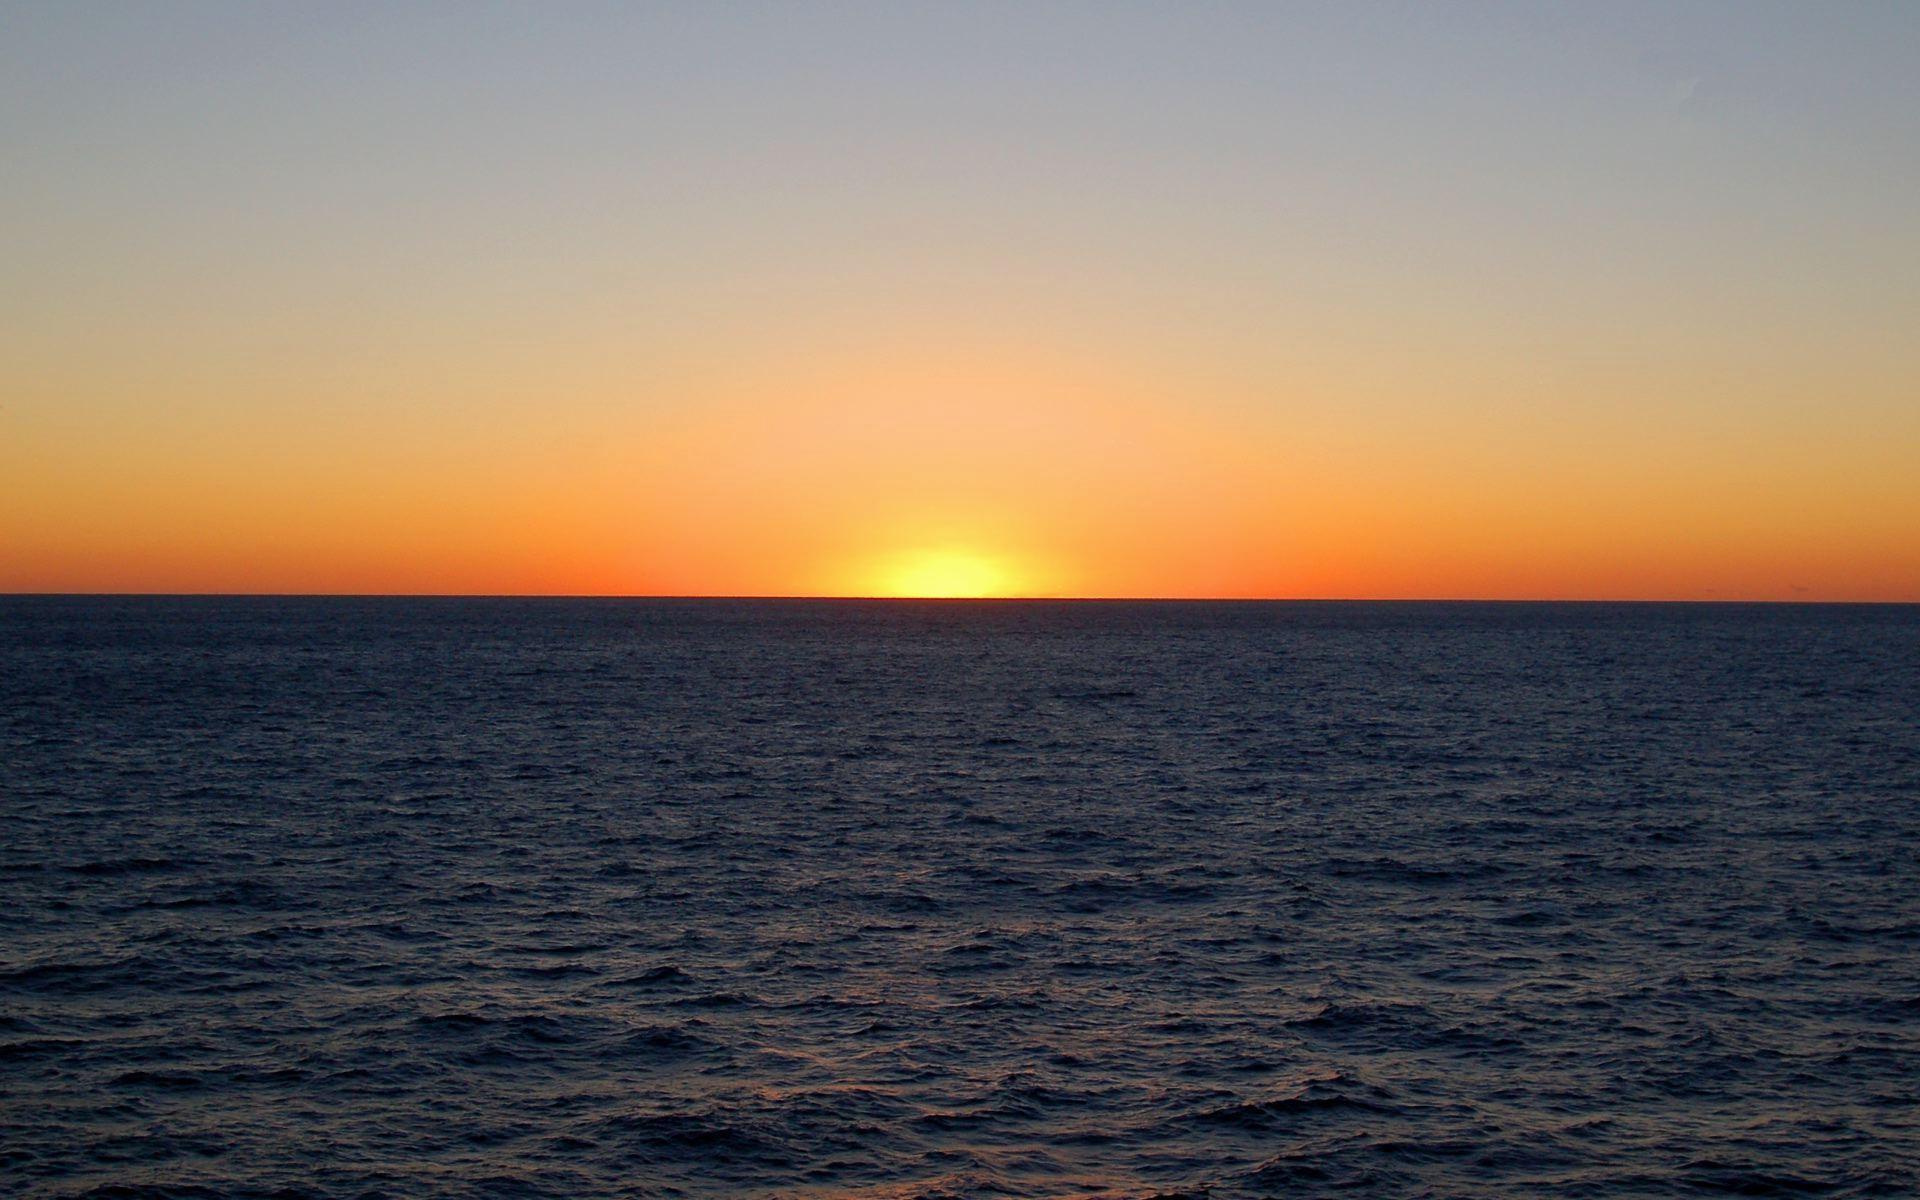 wallpaper.wiki-Wallpapers-freewallpapers-sunset-favorite-hd-PIC-